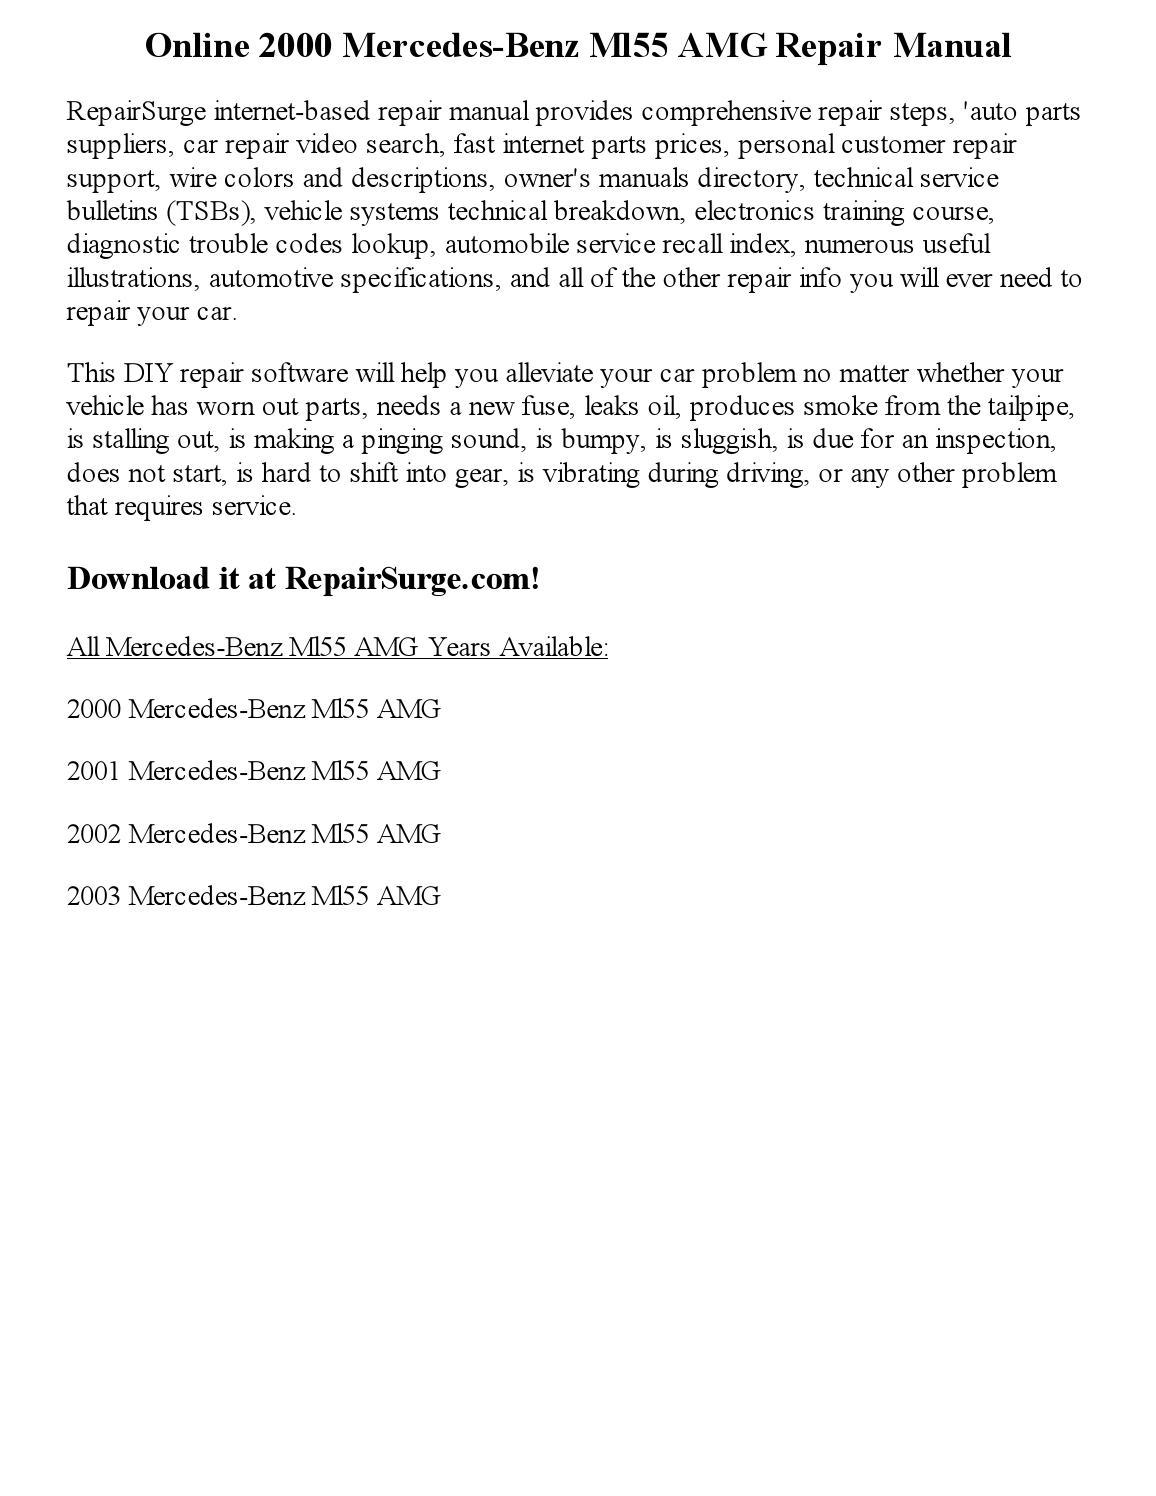 Comfortable Reznor F75 Tall Hss Wiring Regular Bulldog Security System Hh Strat Wiring Youthful Remote Starter Diagram GreenIbanez Gsr100 Bass 2000 Mercedes Benz Ml55 AMG Repair Manual Online By Nicole   Issuu